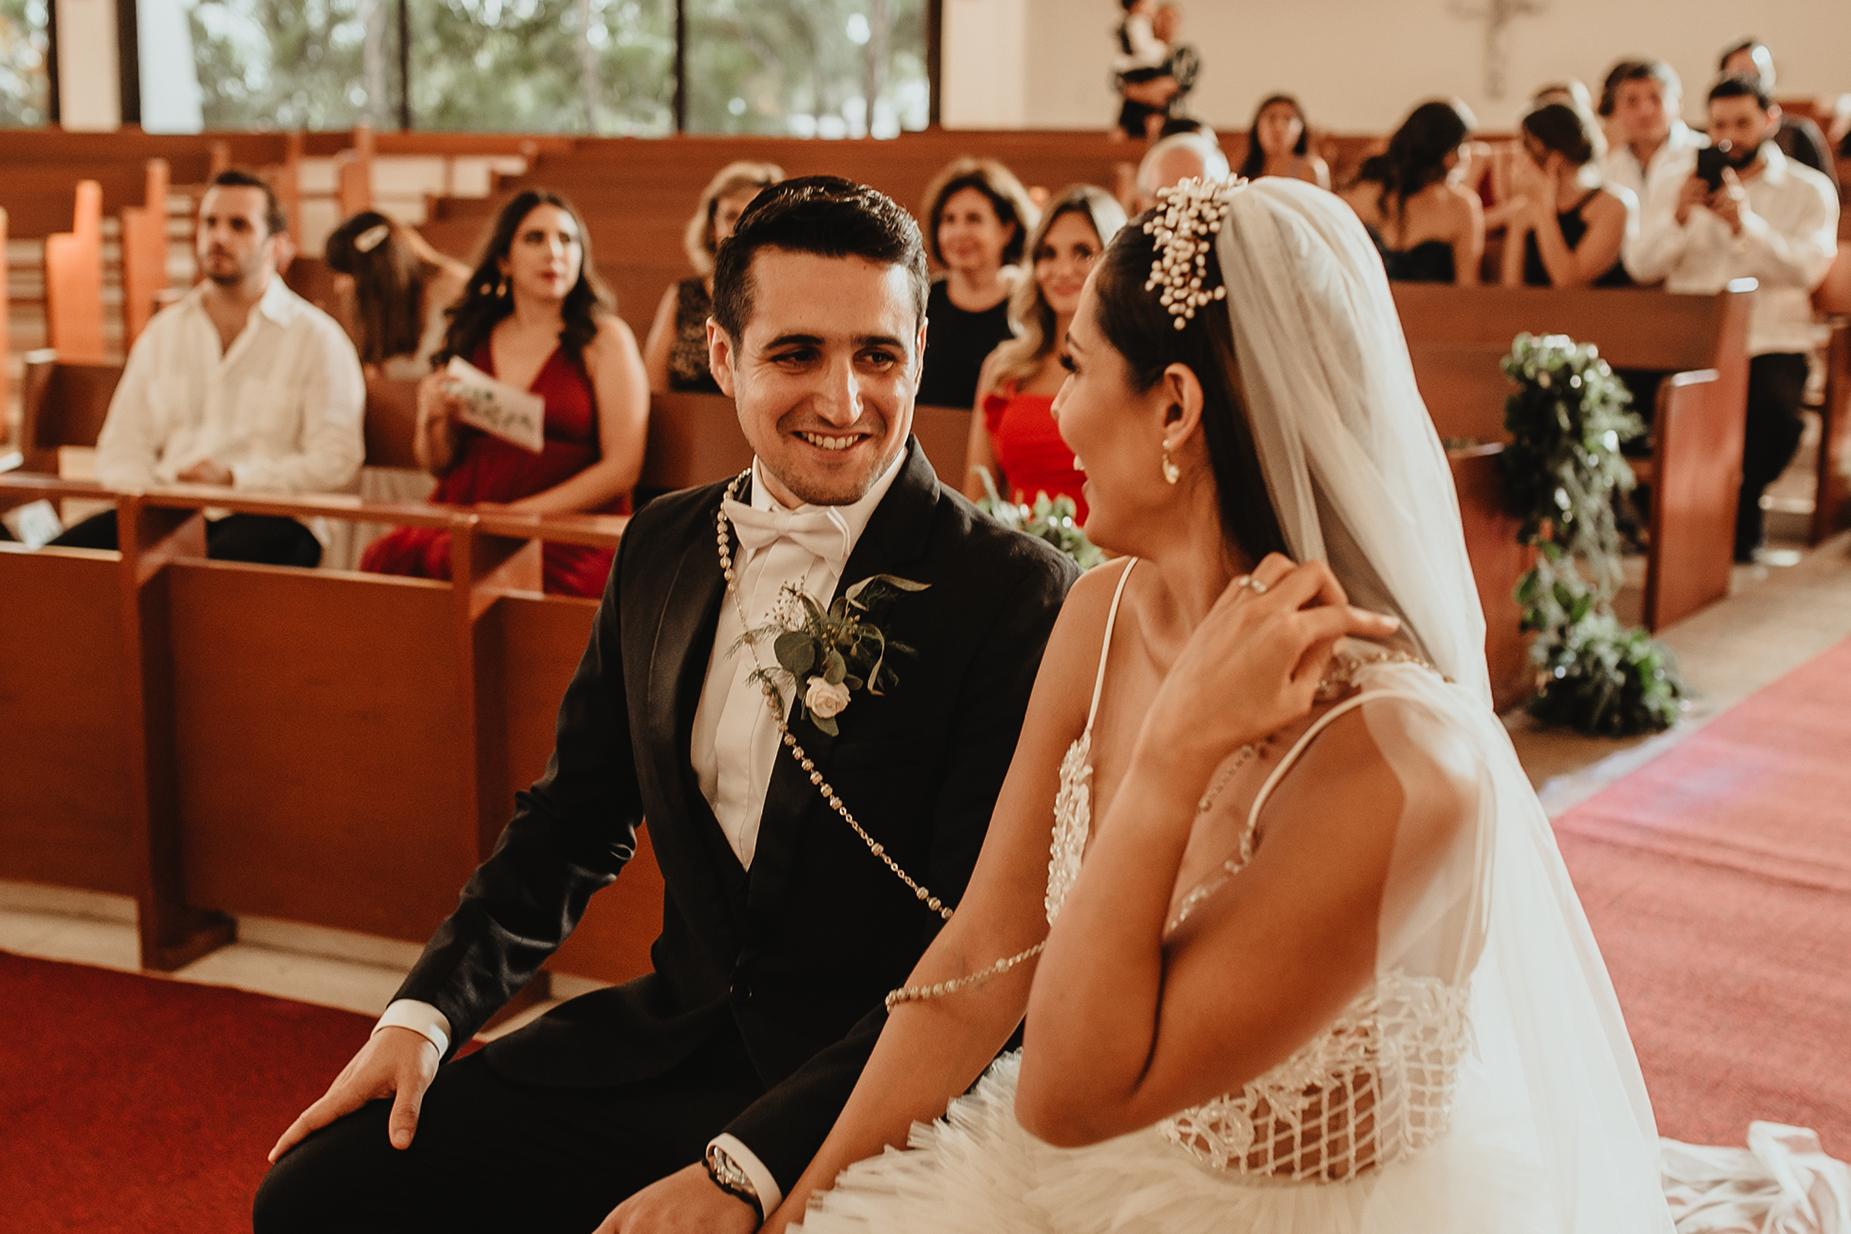 0704R&F__WeddingDestination_Weddingmerida_BodaMexico_FotografoDeBodas_FabrizioSimoneenFotografo.jpg